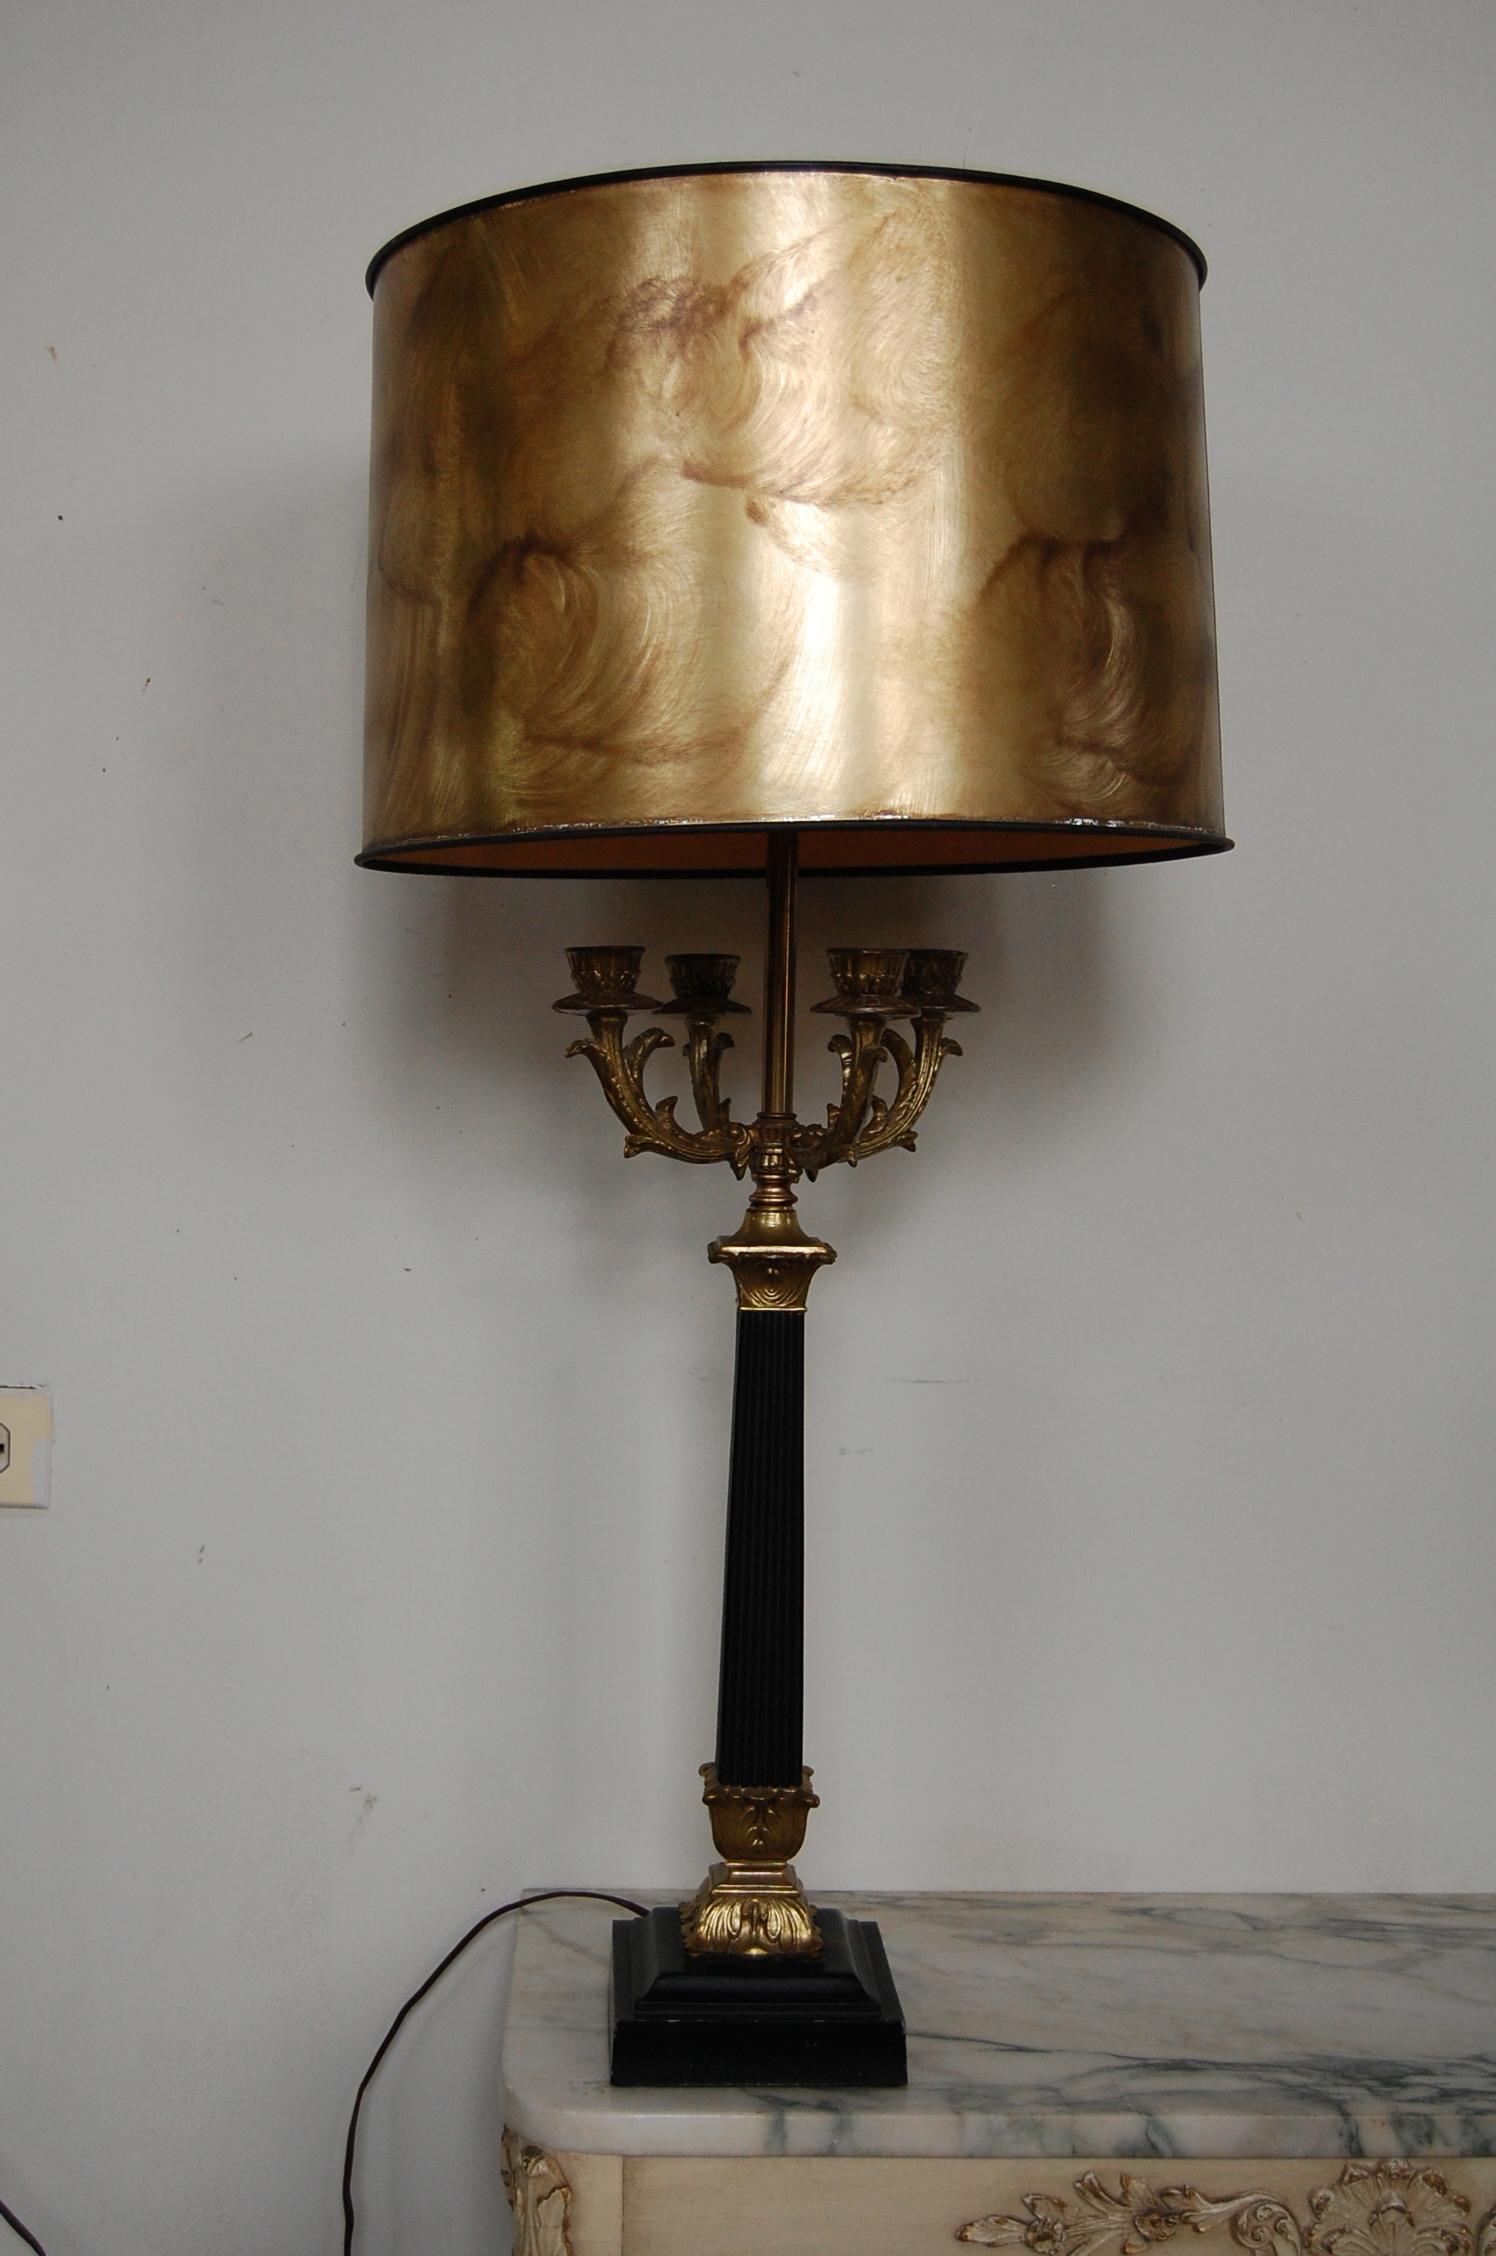 Tall Black U0026 Gold Neoclassical Candelabra Lamp   Image 8 ...